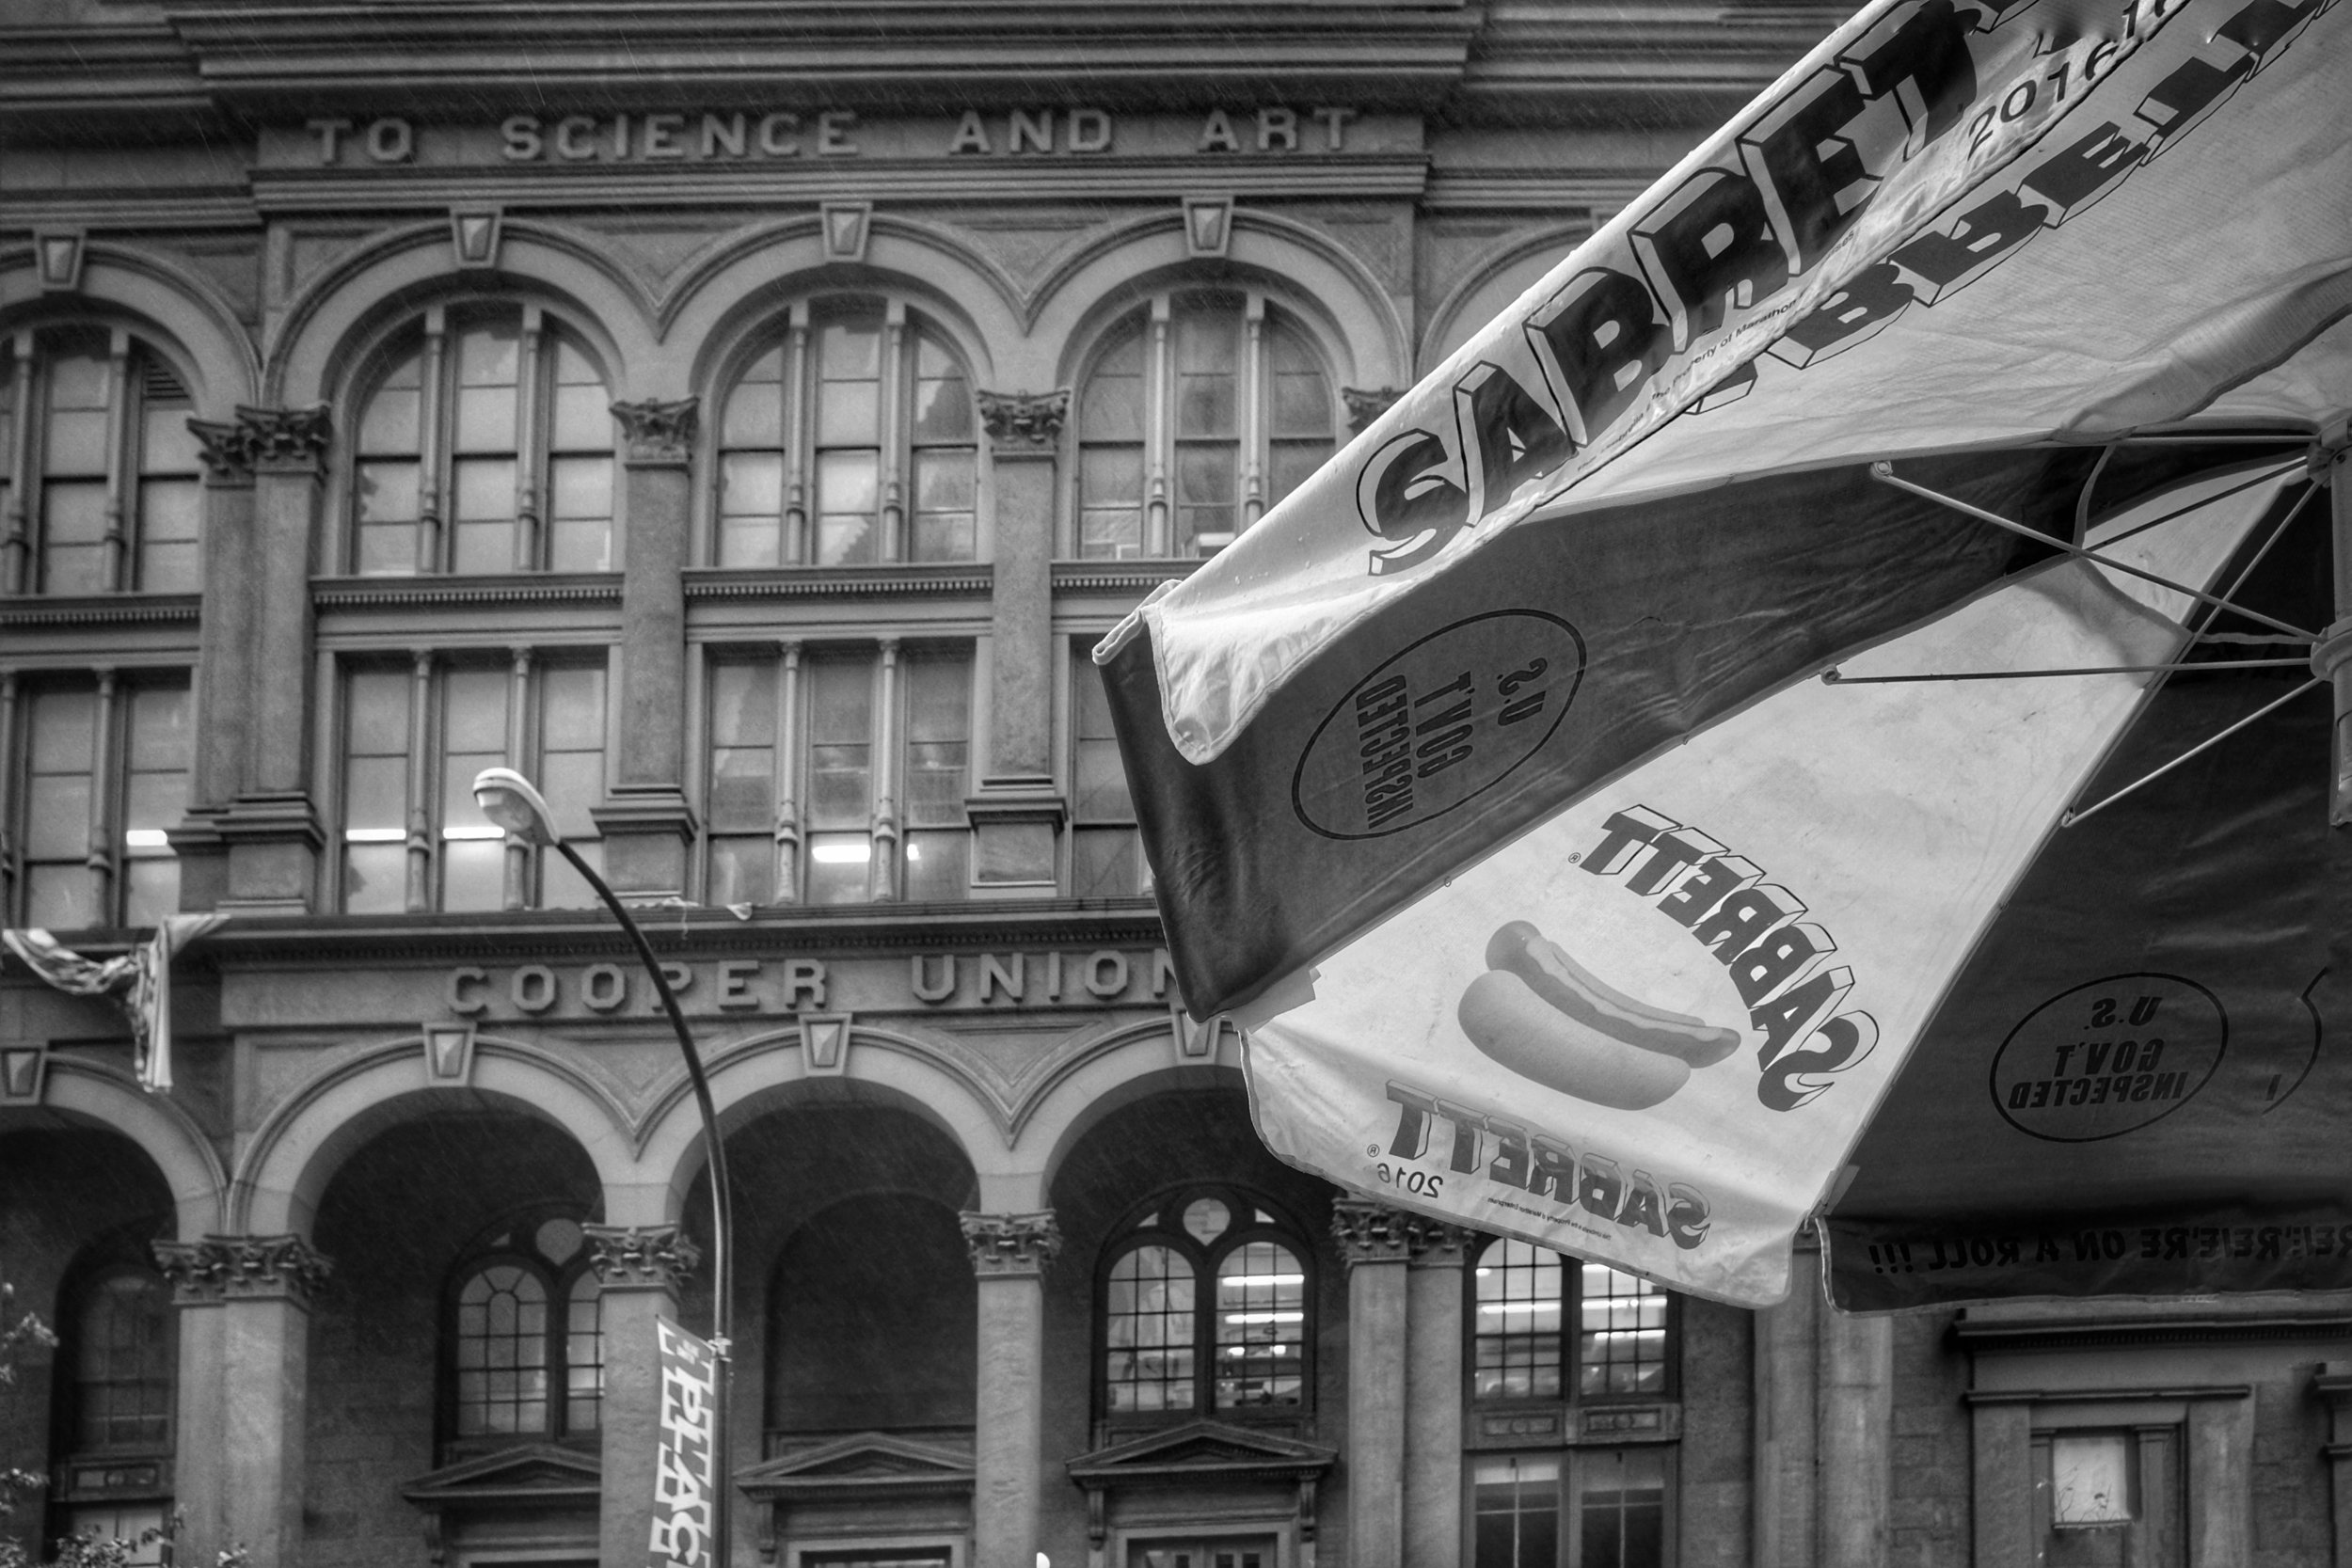 Cooper Union. East Village. New York City. 2016.